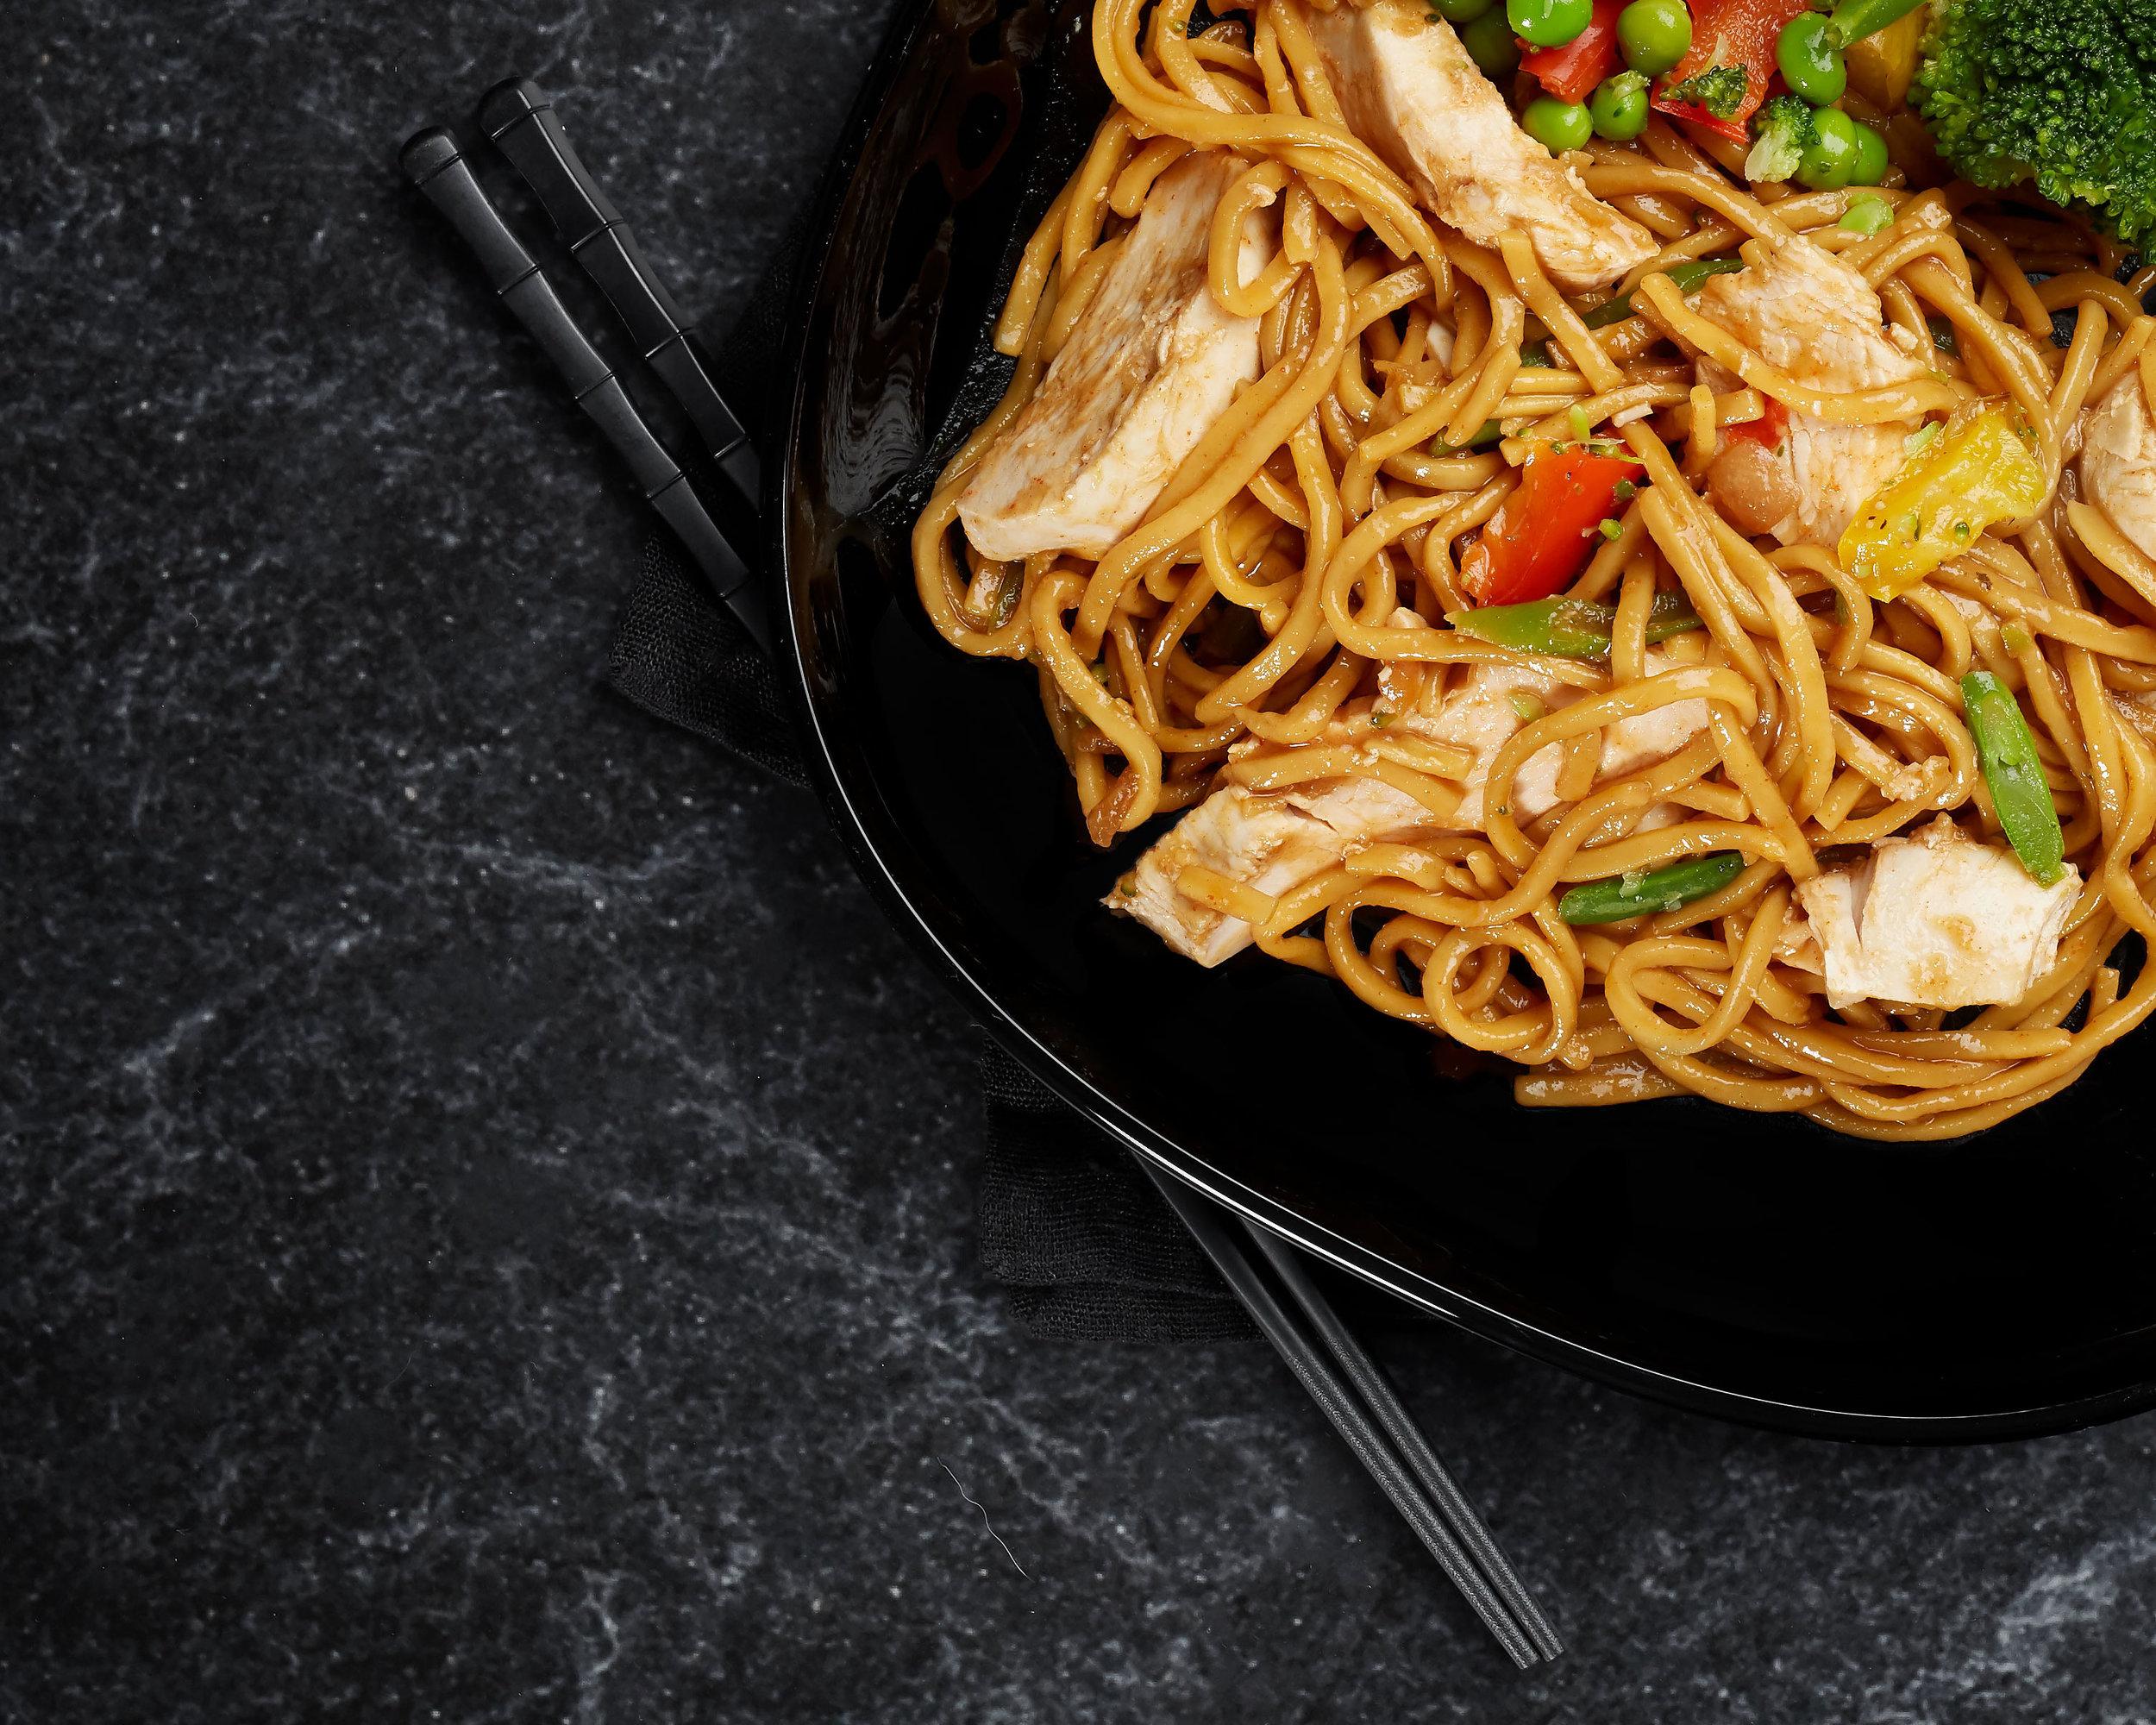 Spicy-noodle-1.jpg